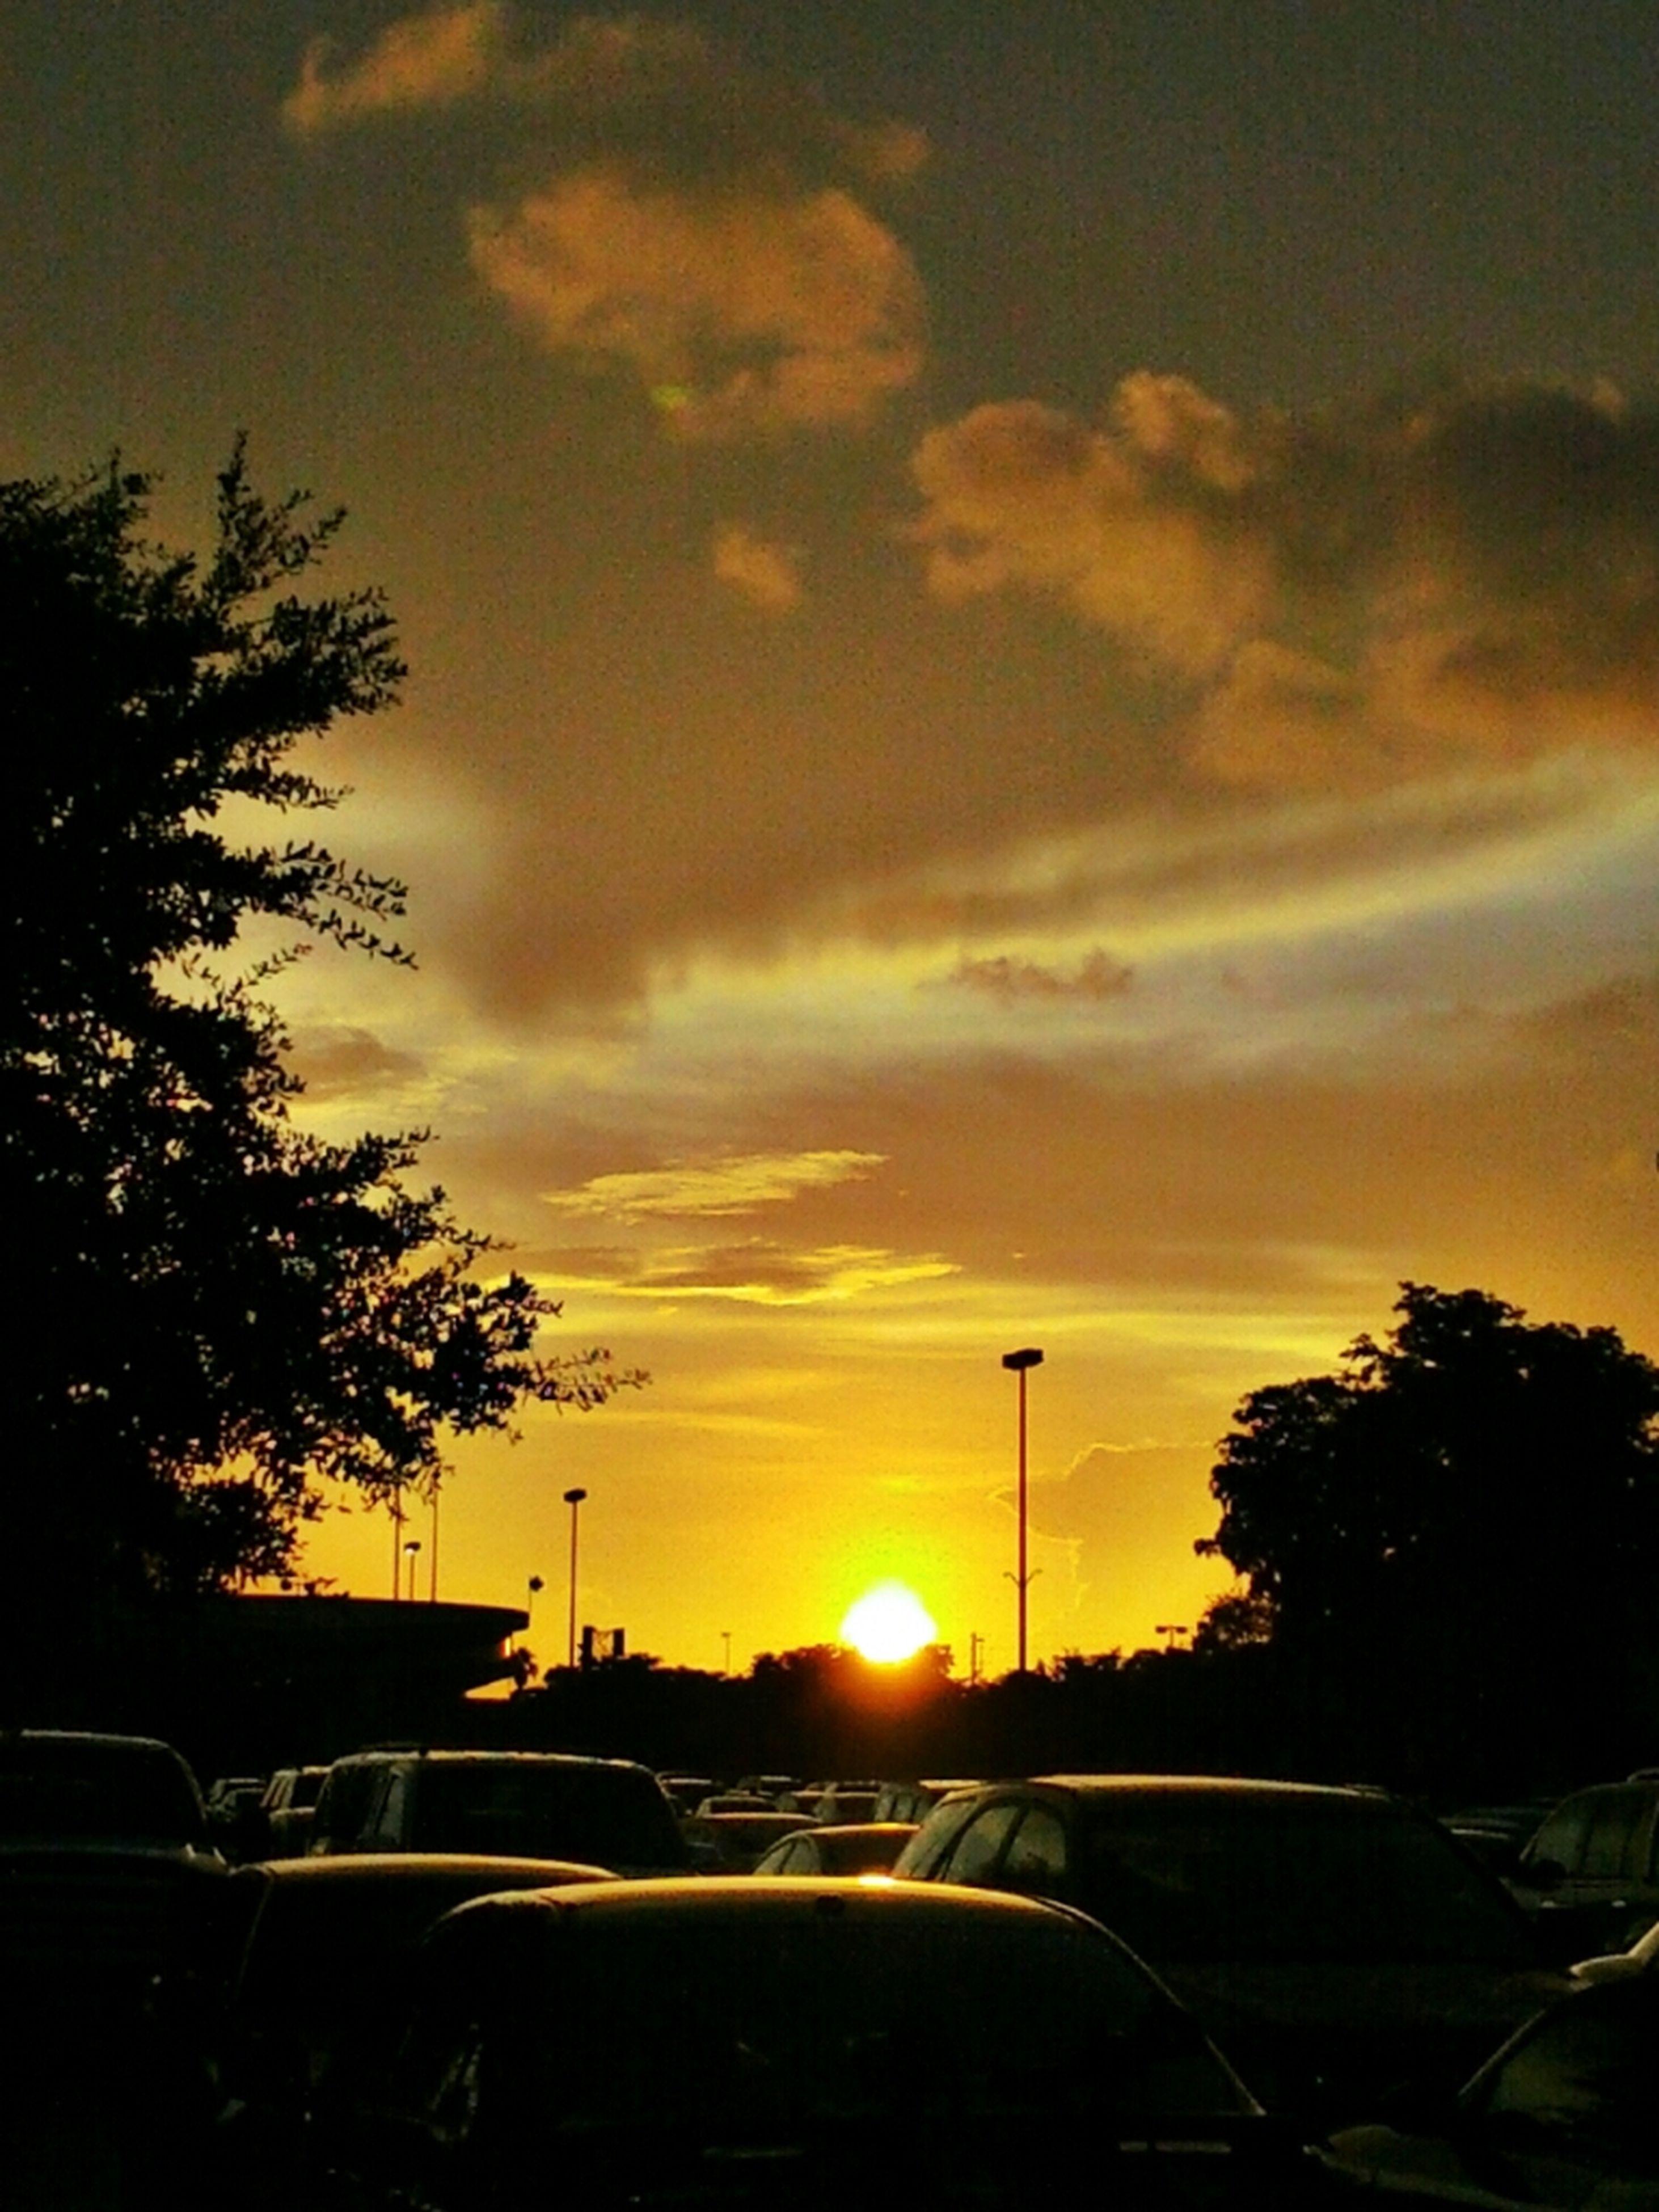 sunset, transportation, car, land vehicle, silhouette, sky, tree, mode of transport, orange color, road, sun, cloud - sky, street light, street, nature, sunlight, traffic, beauty in nature, outdoors, cloud